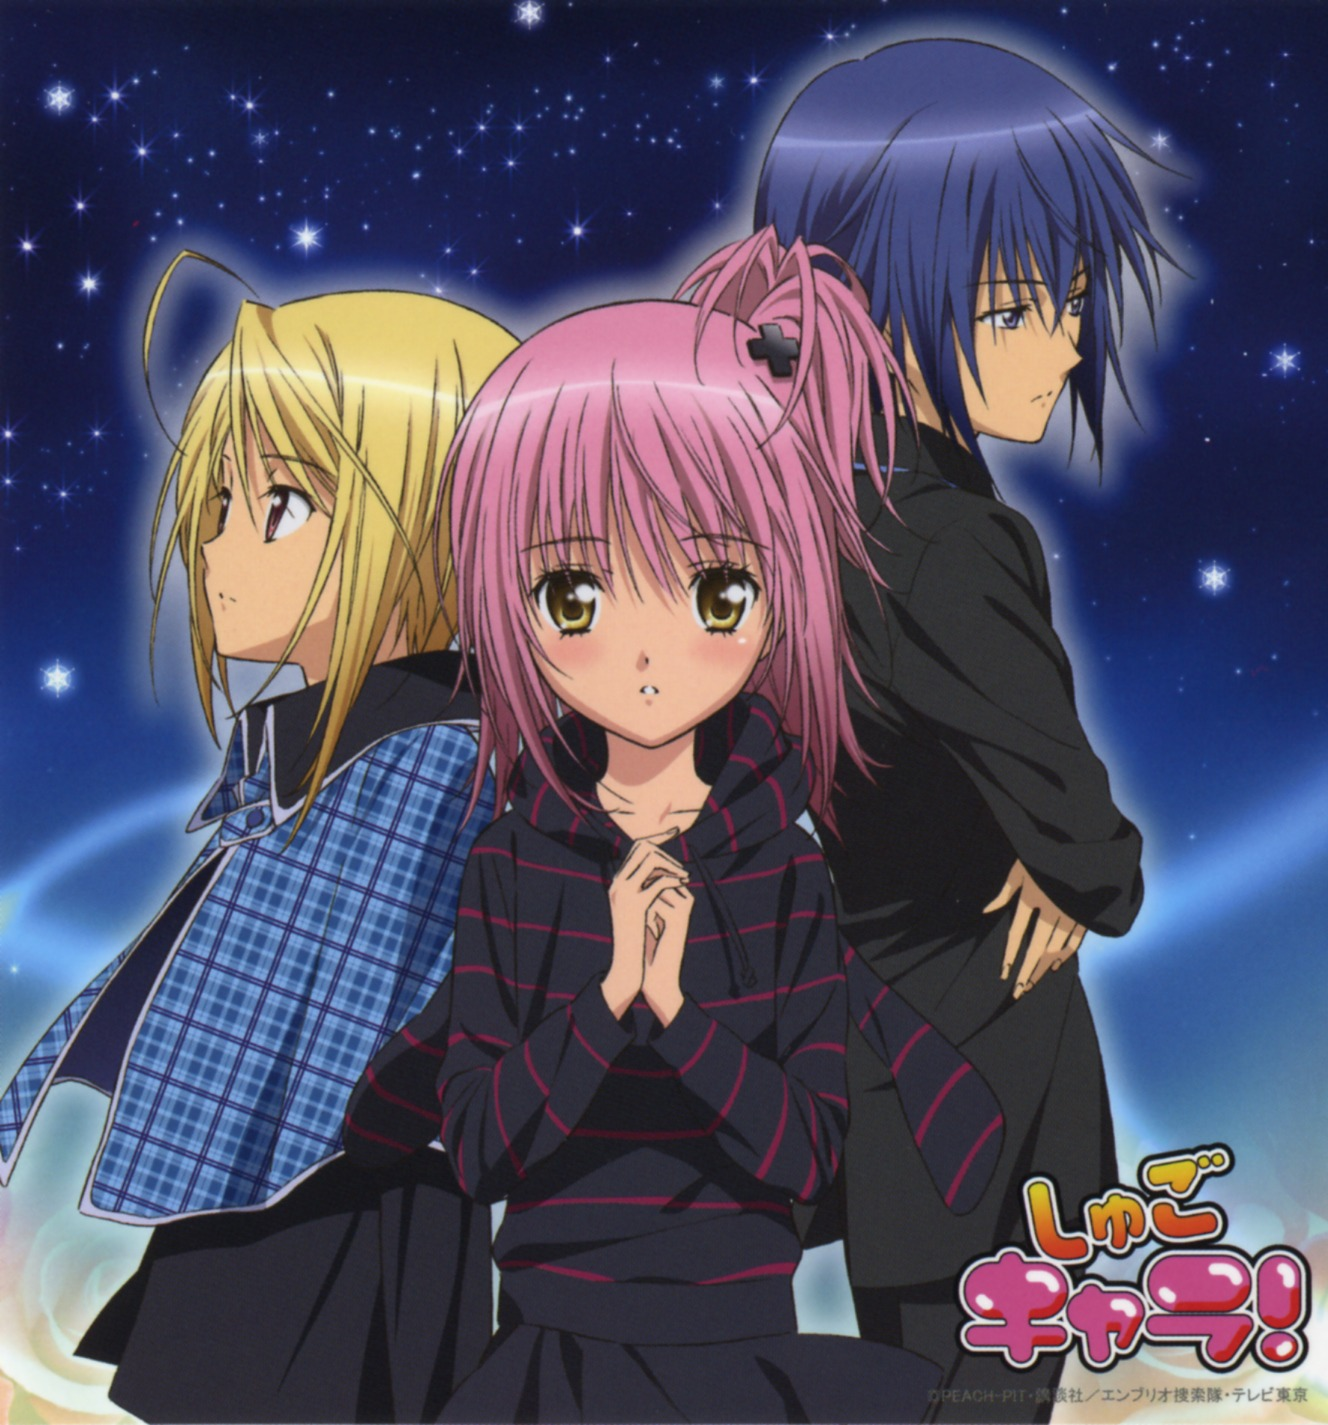 http://1.bp.blogspot.com/-Gp0V3wrD8xk/T_kixFvgJjI/AAAAAAAAAjo/REDd5OIWxGc/s1600/MJV-ART.ORG_-_138620-1328x1425-shugo+chara%2521-hinamori+amu-tsukiyomi+ikuto-hotori+tadase-girl-short+hair.jpg